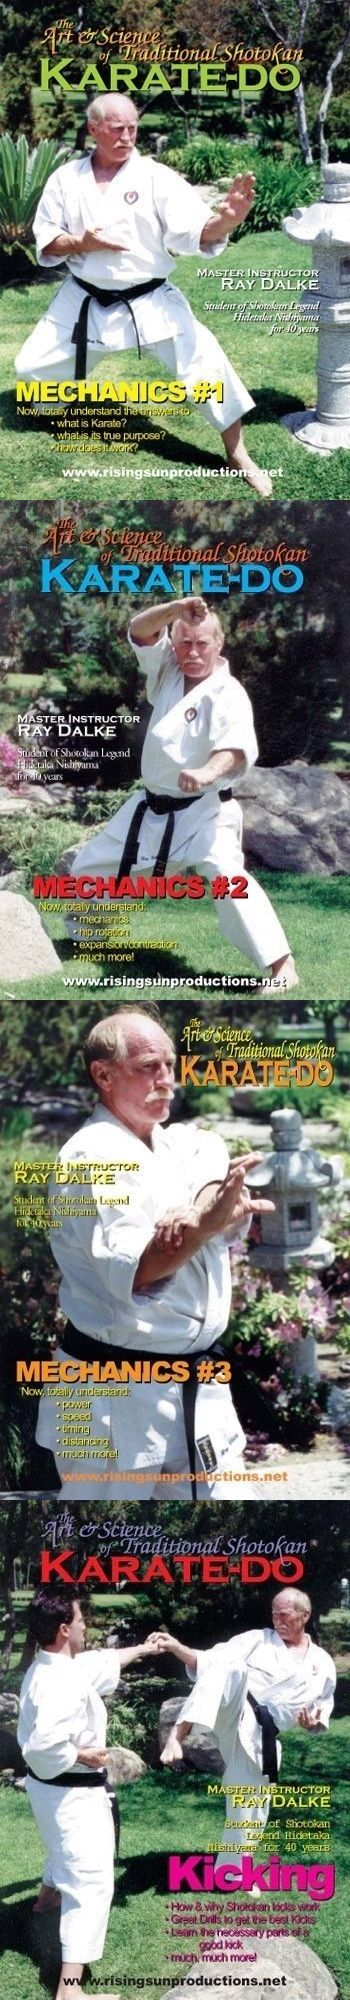 DVDs Videos and Books 73991: 8 Dvd Set Complete Art Shotokan Karate Mechanics Kicking Kata Kumite Ray Dalke -> BUY IT NOW ONLY: $149.95 on eBay!